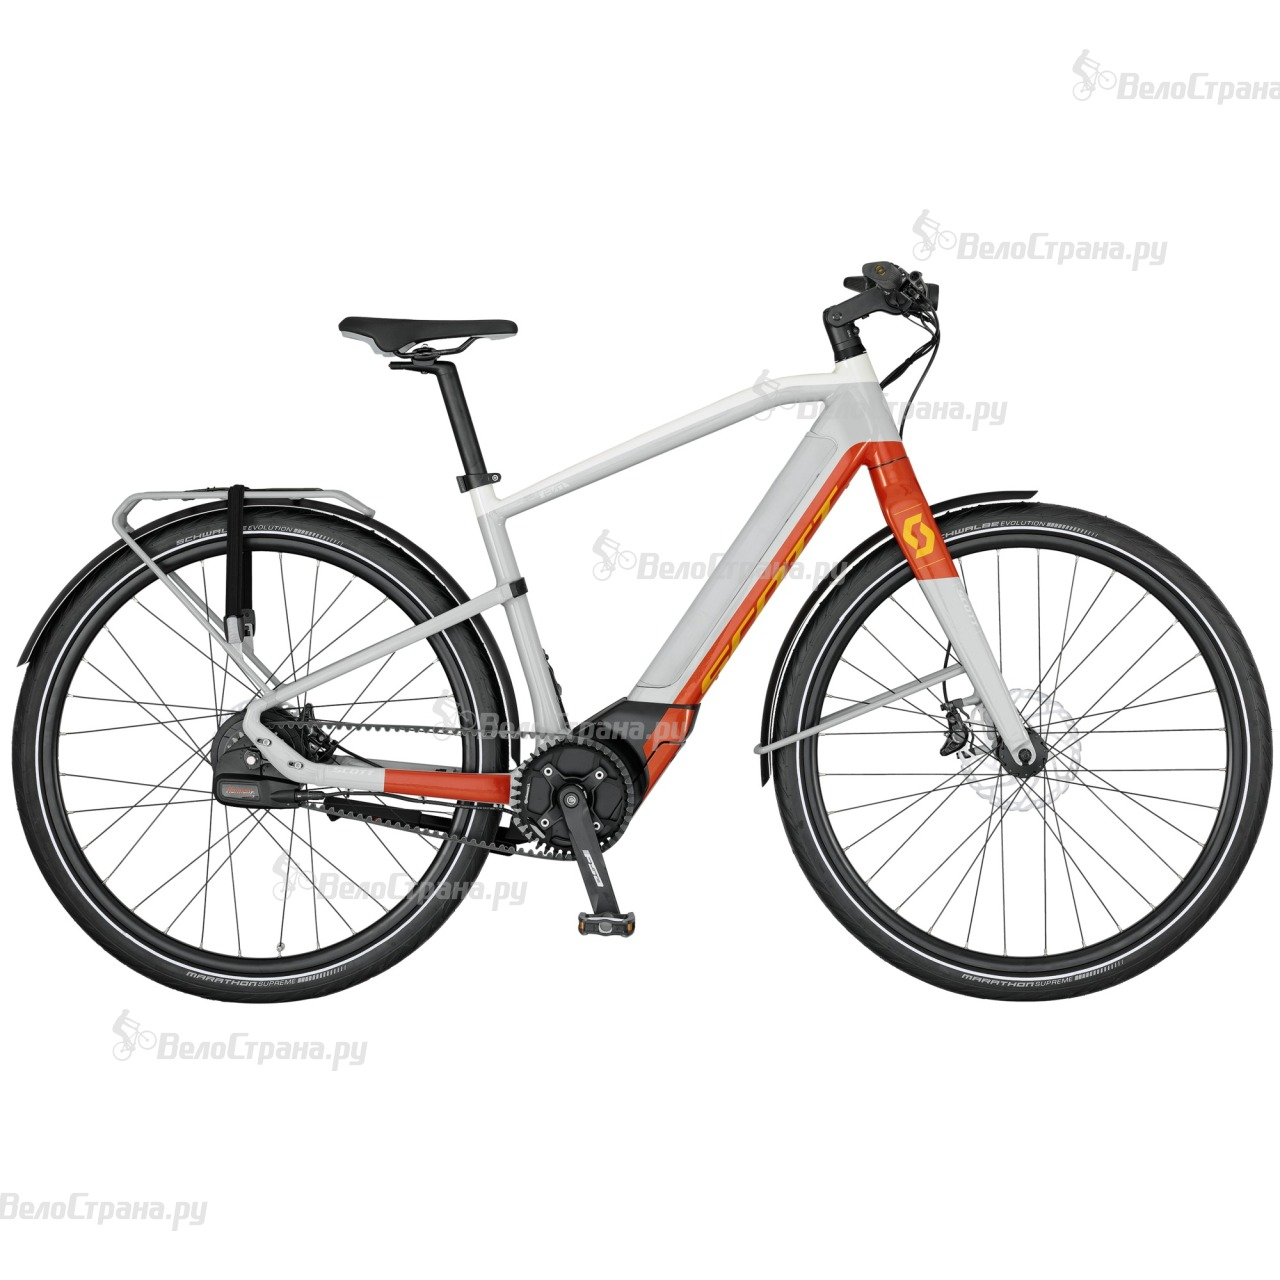 Велосипед Scott E-Silence Evo (2017) велосипед scott e silence evo 2017